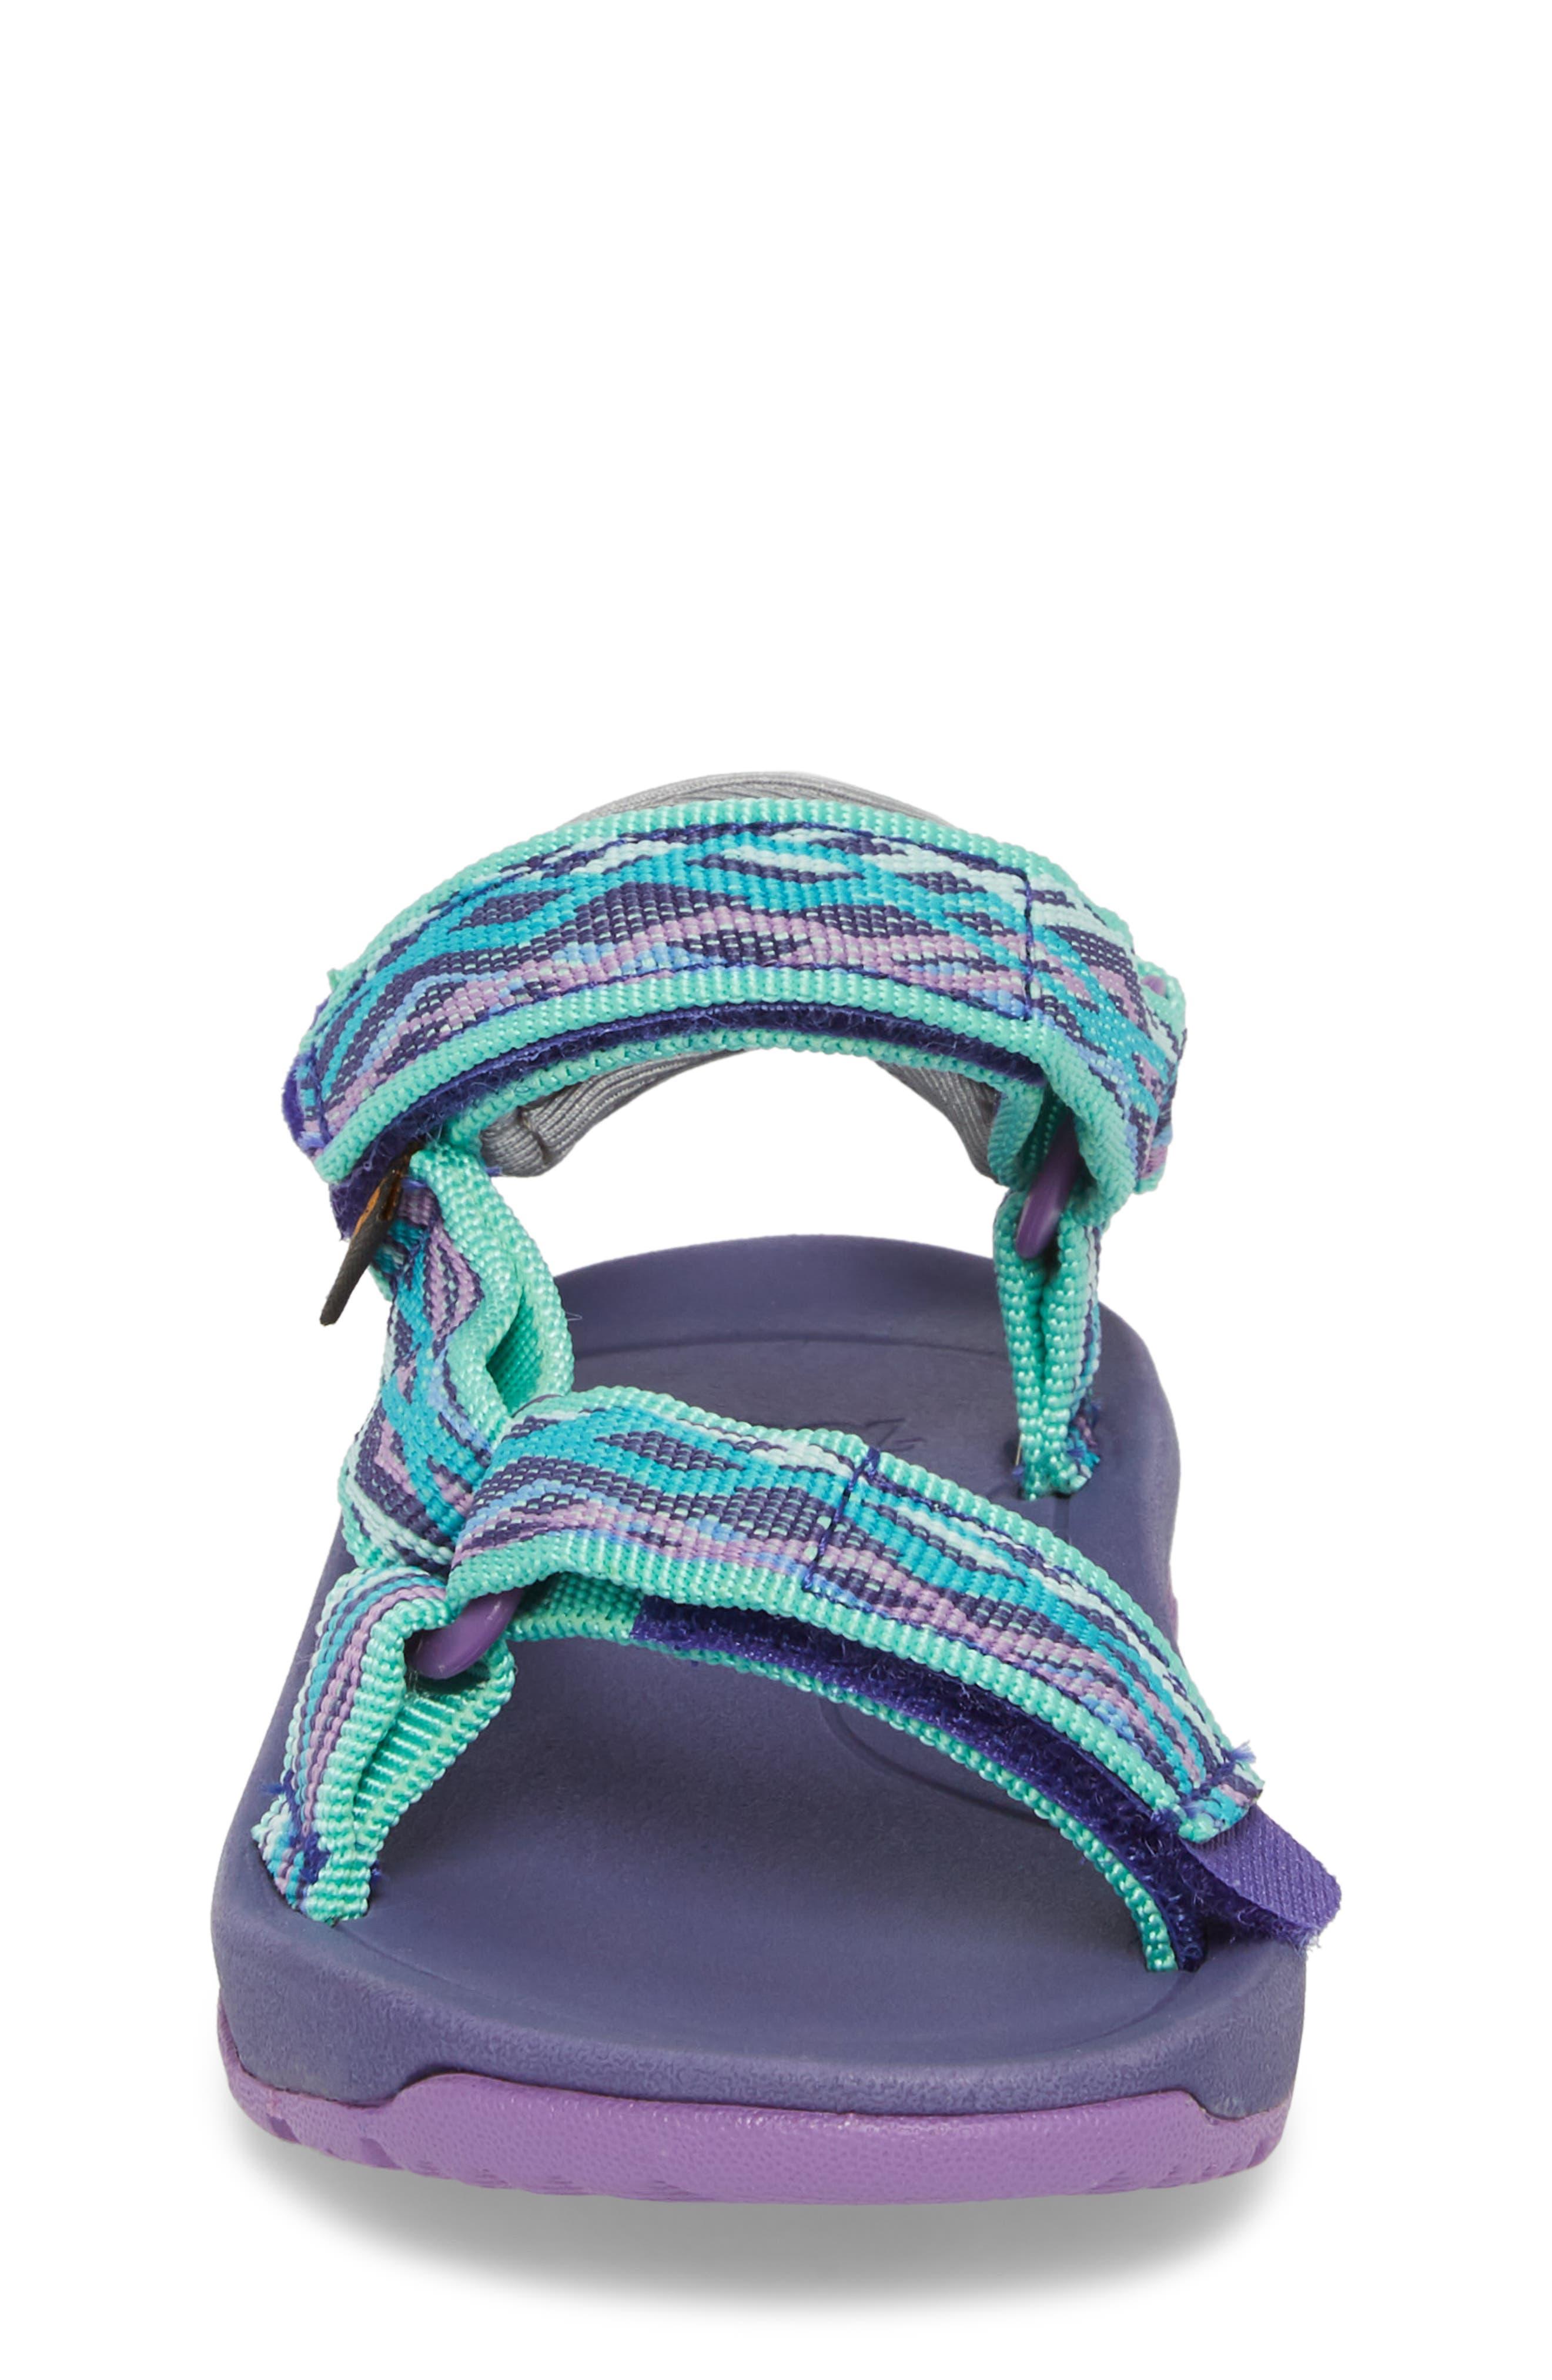 Hurricane XLT 2 Sandal,                             Alternate thumbnail 4, color,                             Delmar Sea Glass / Purple